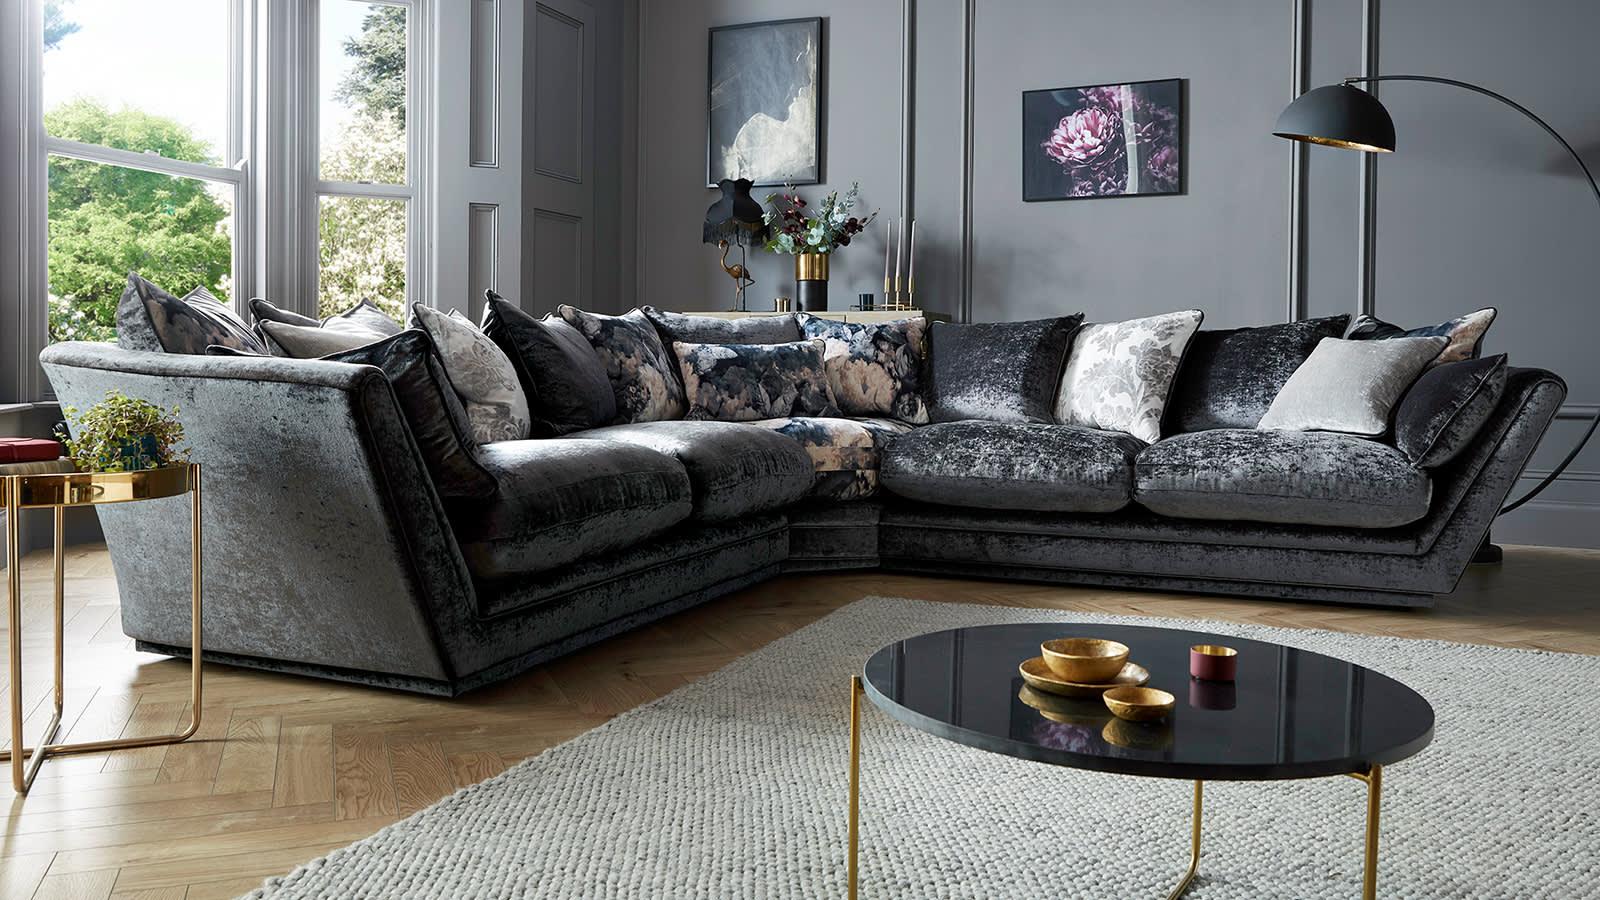 Sofology Evangeline sofa